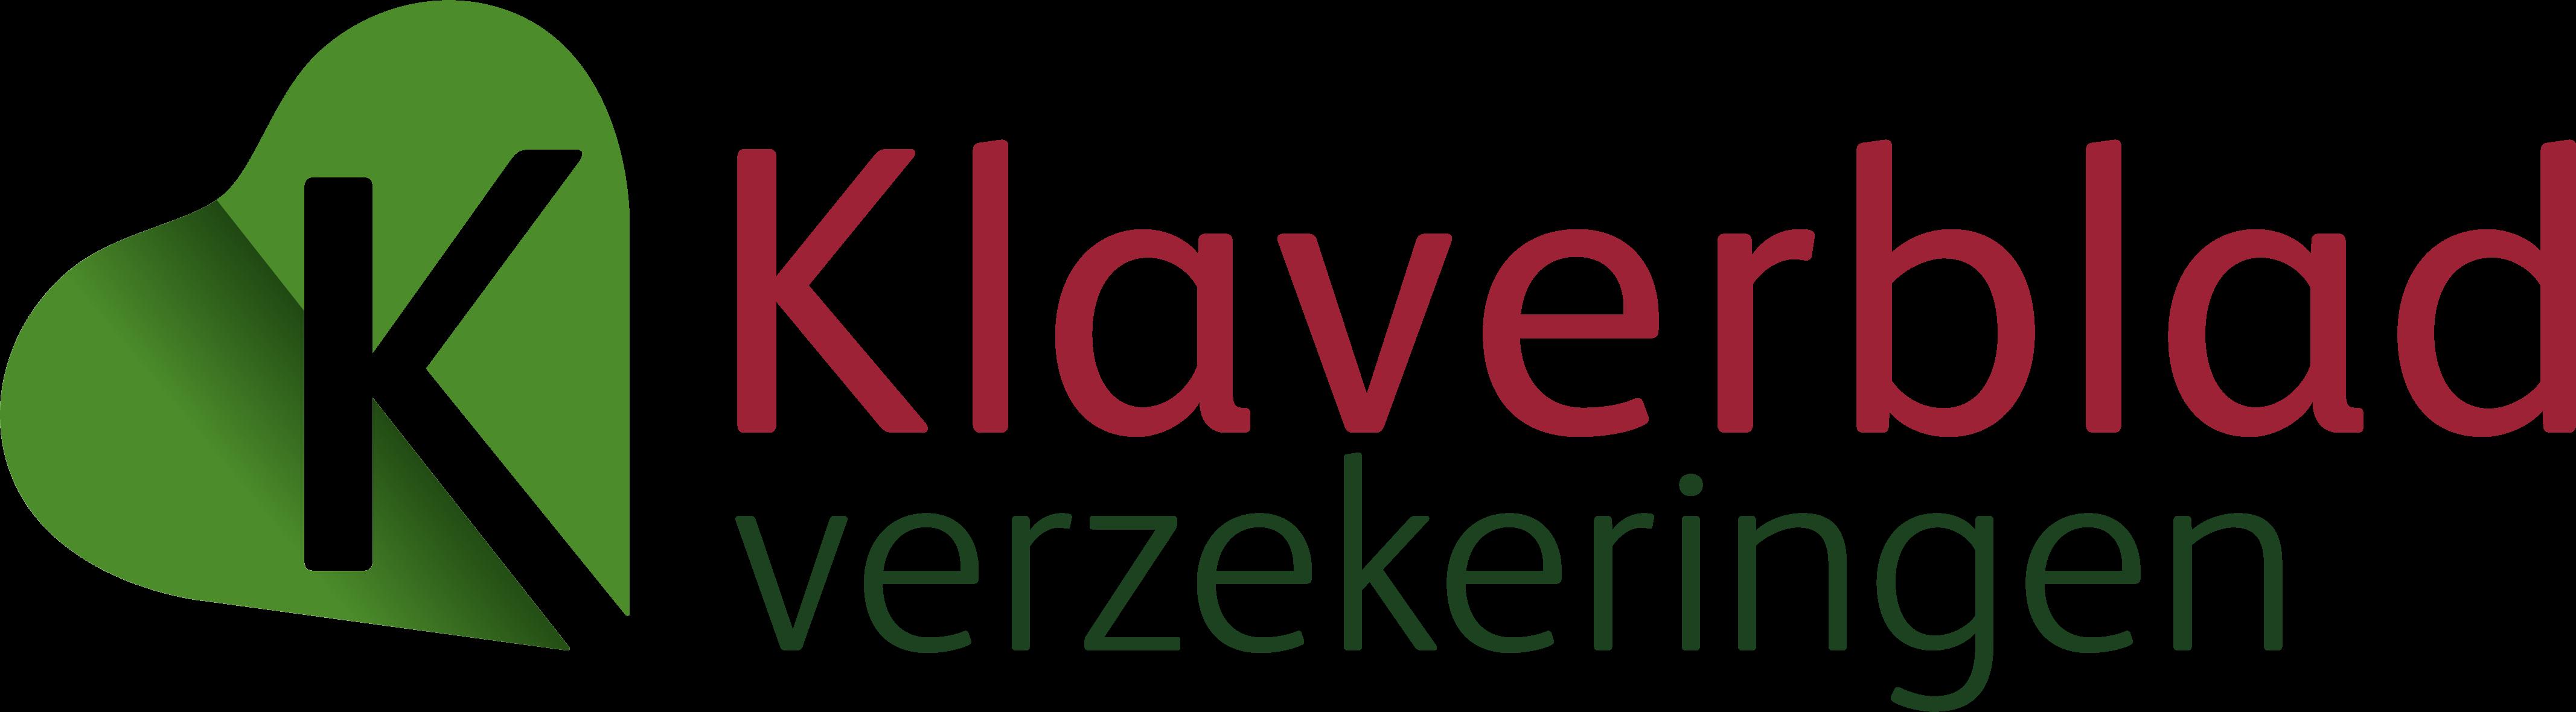 logoKlaverblad